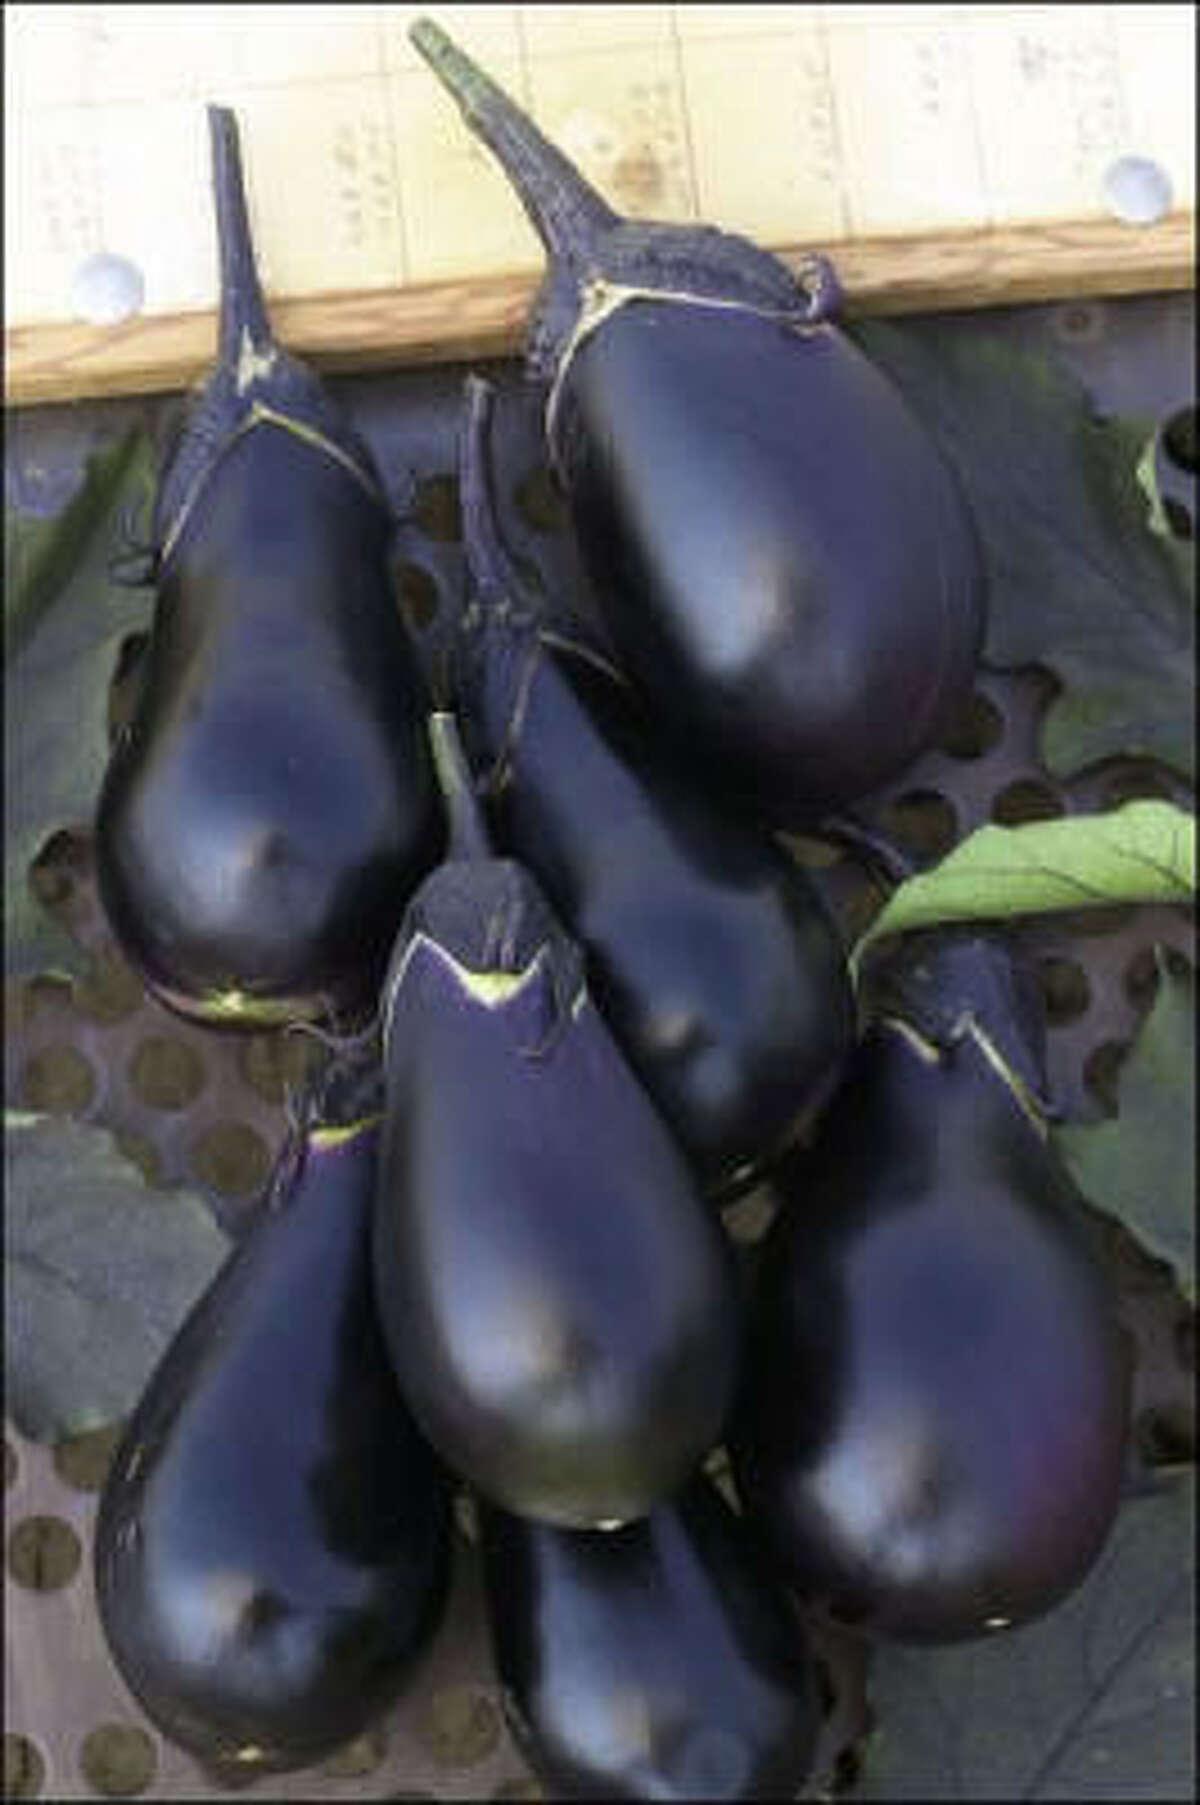 'Black Egg' eggplant